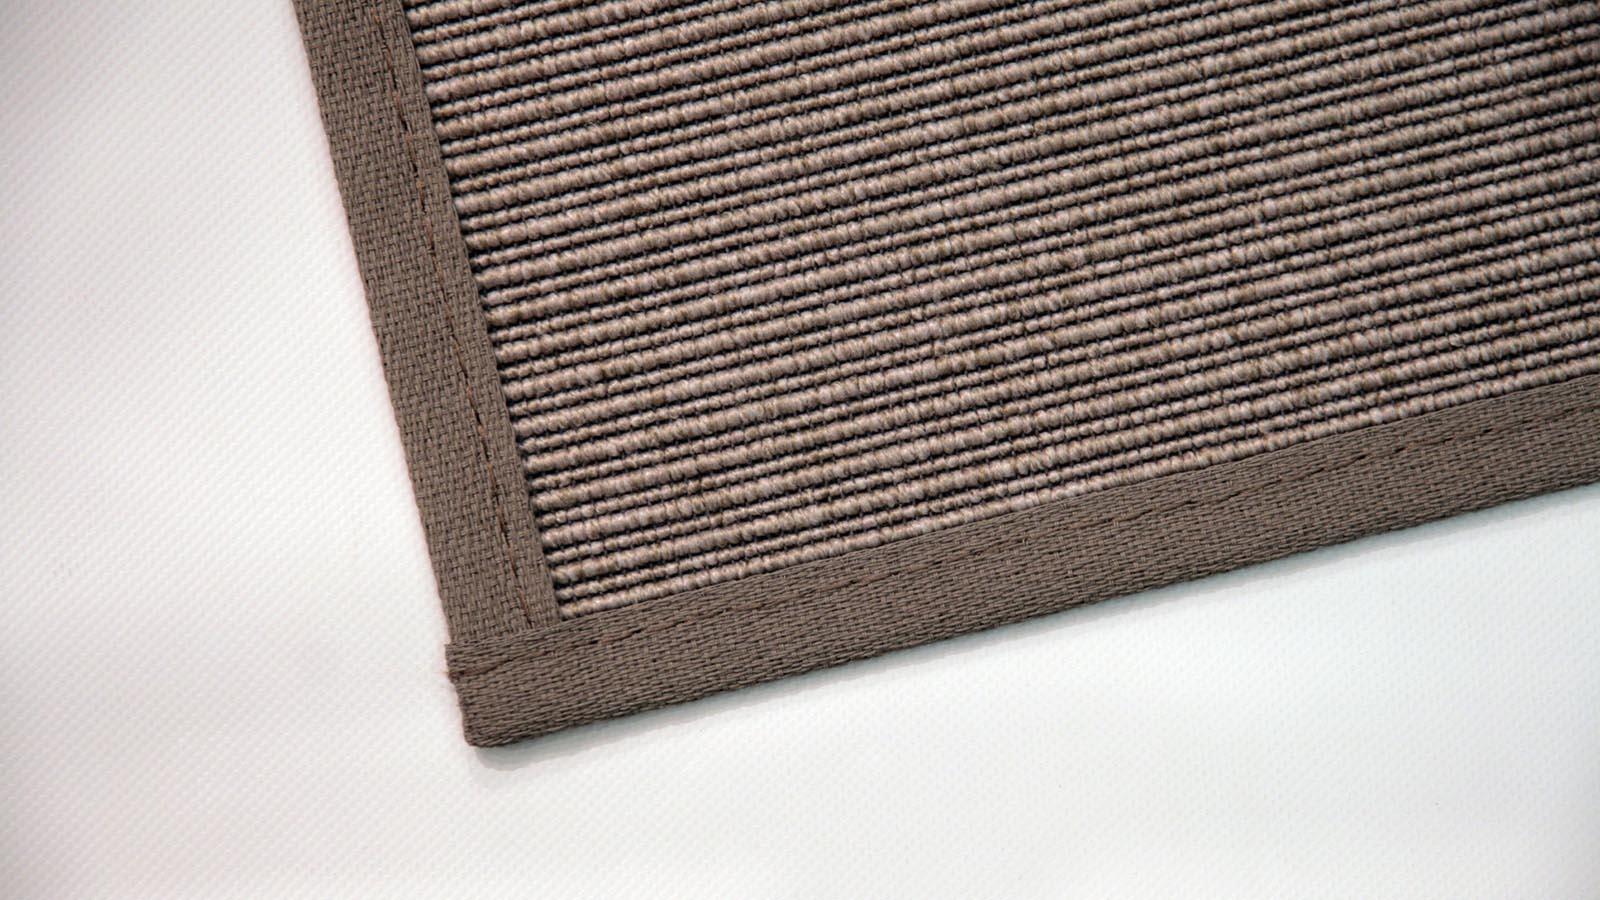 Alfombra kp krochet fern ndez textil - Alfombras kp online ...